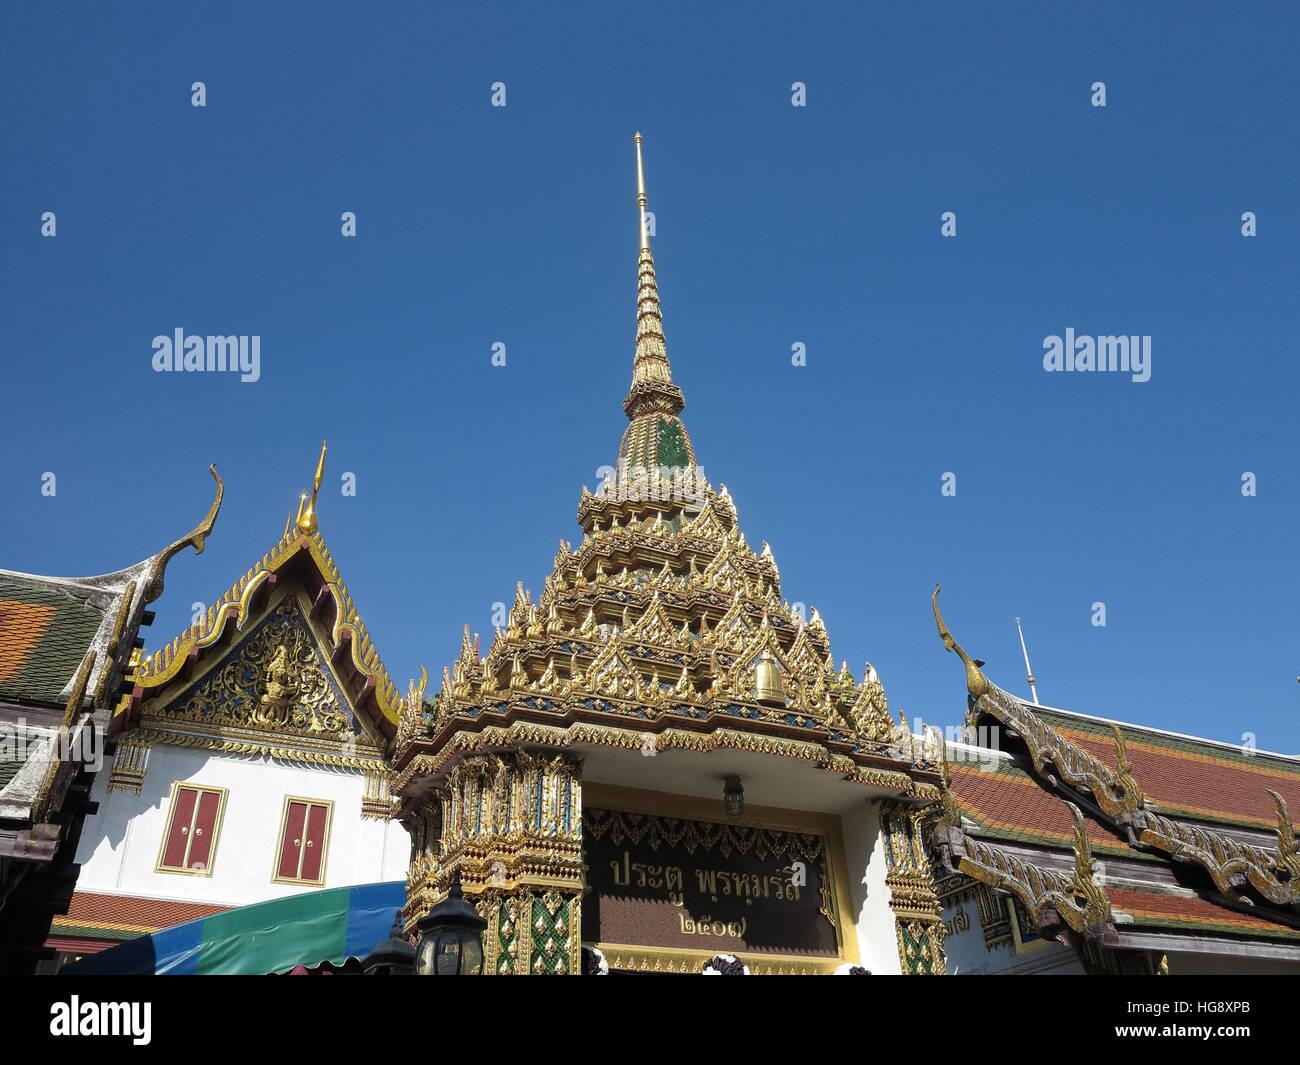 The gate to the prayer hall of Wat Rakhang Khositaram, Bangkok. - Stock Image